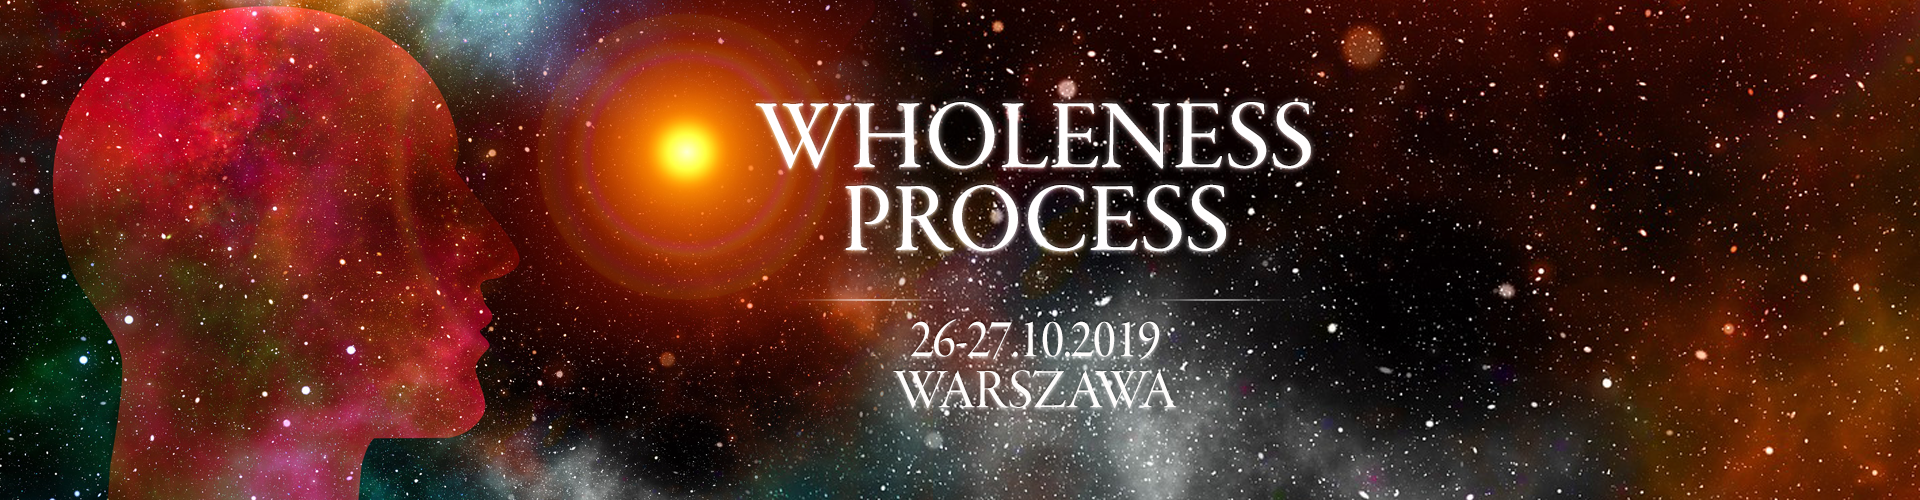 WHOLENESS-PROCESS-DUZY